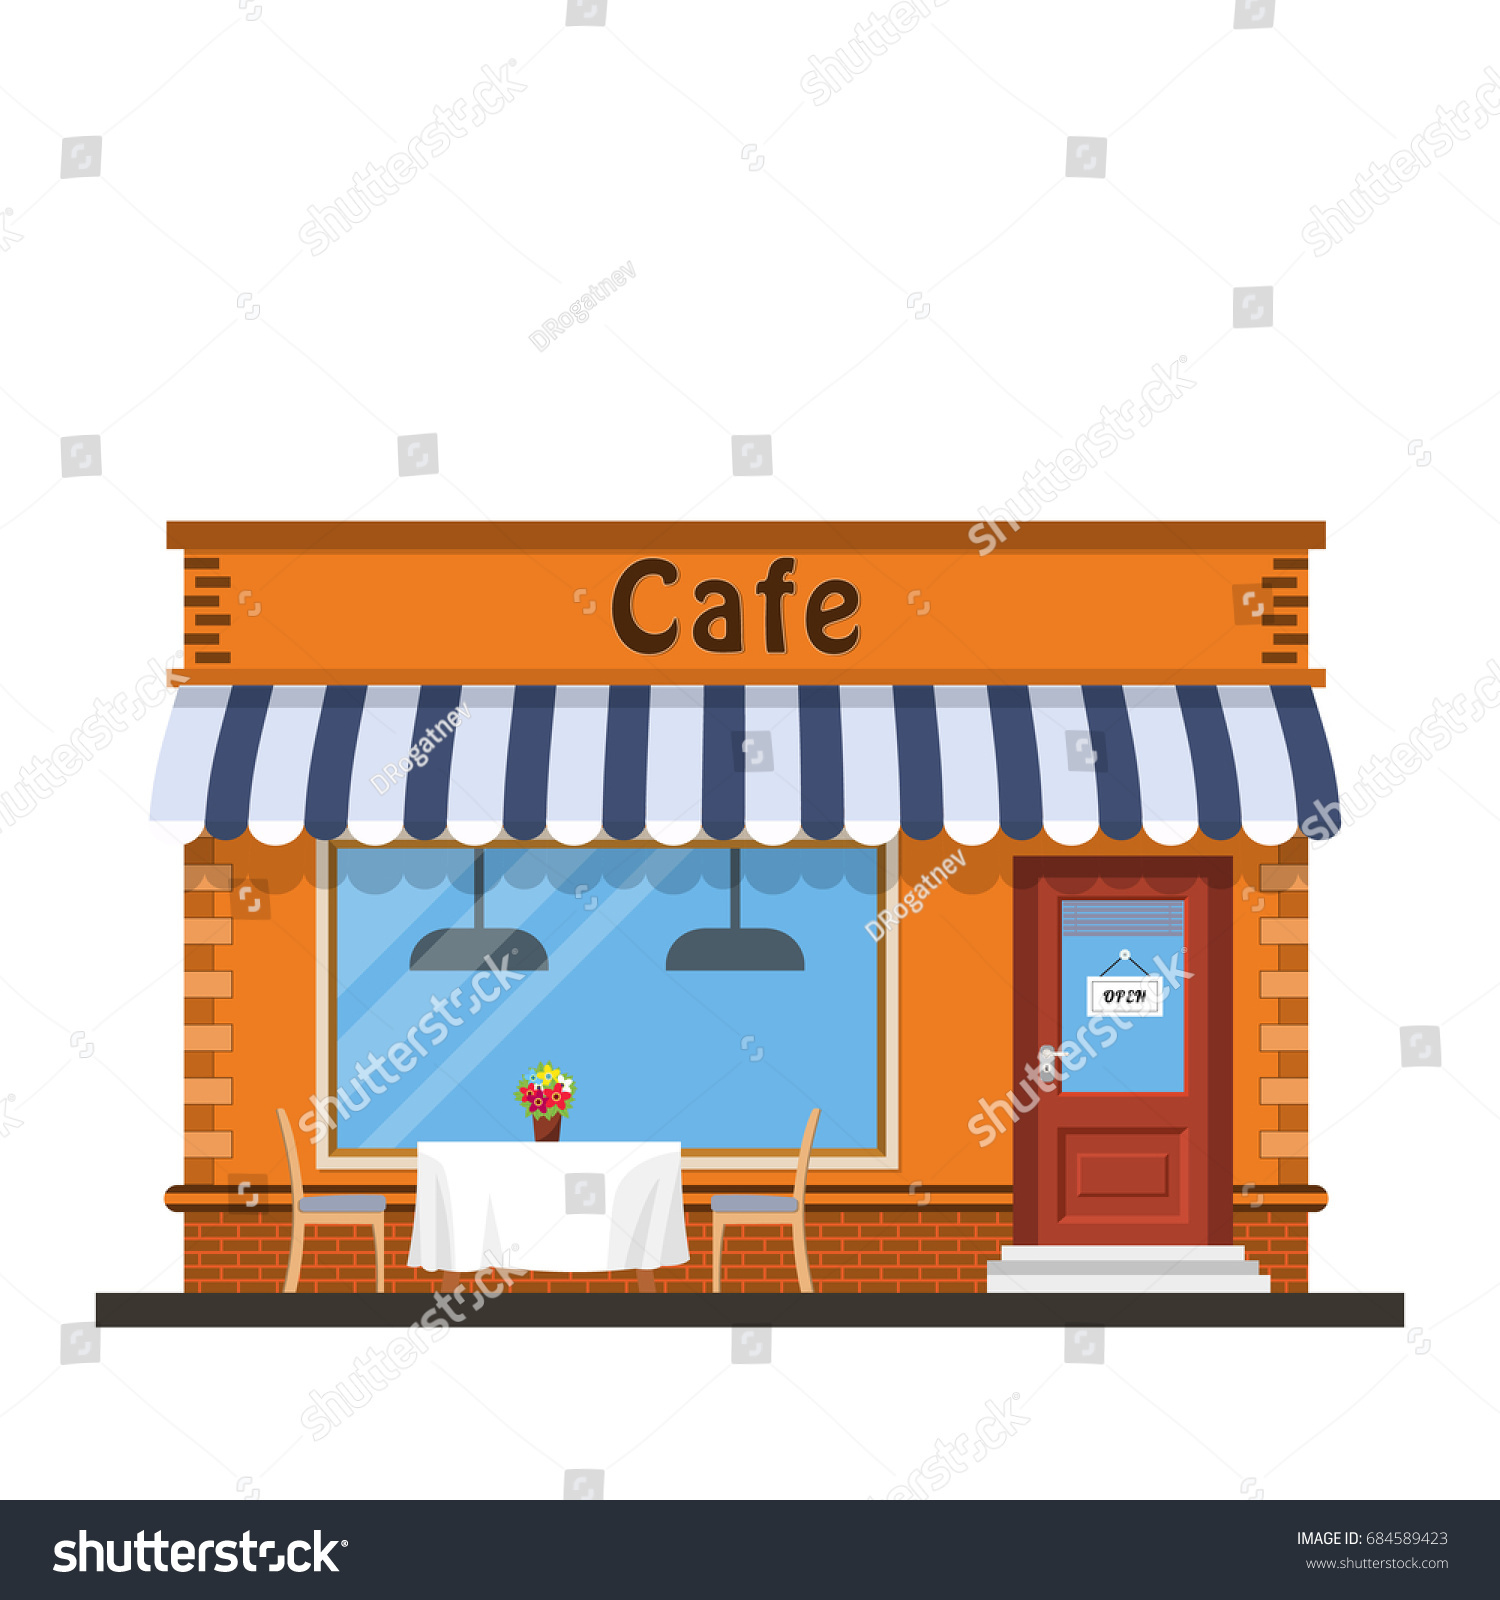 Vector De Stock Libre De Regalias Sobre Cafe Shop Exterior Street Restraunt Building684589423